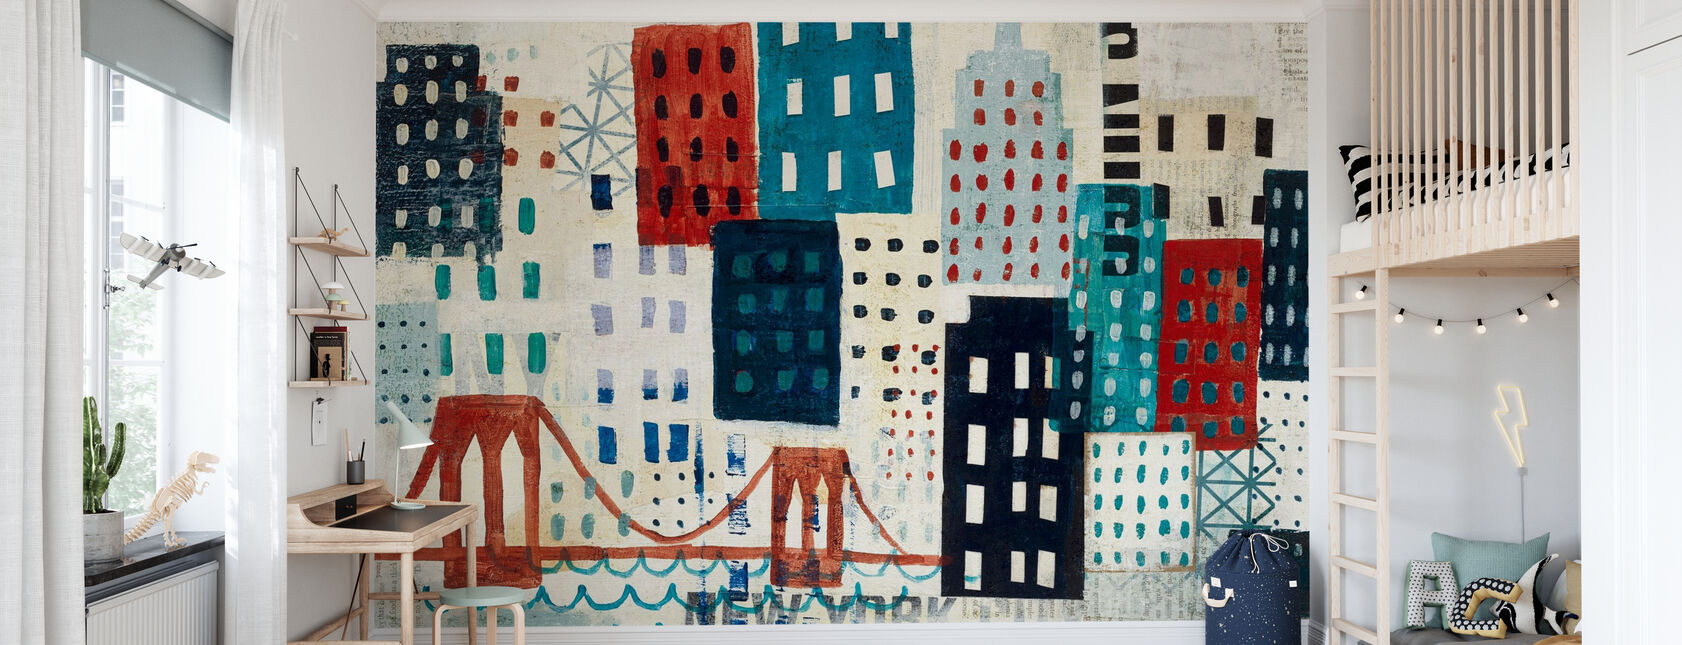 Collage Skyline di New York - Blu I - Carta da parati - Camera dei bambini